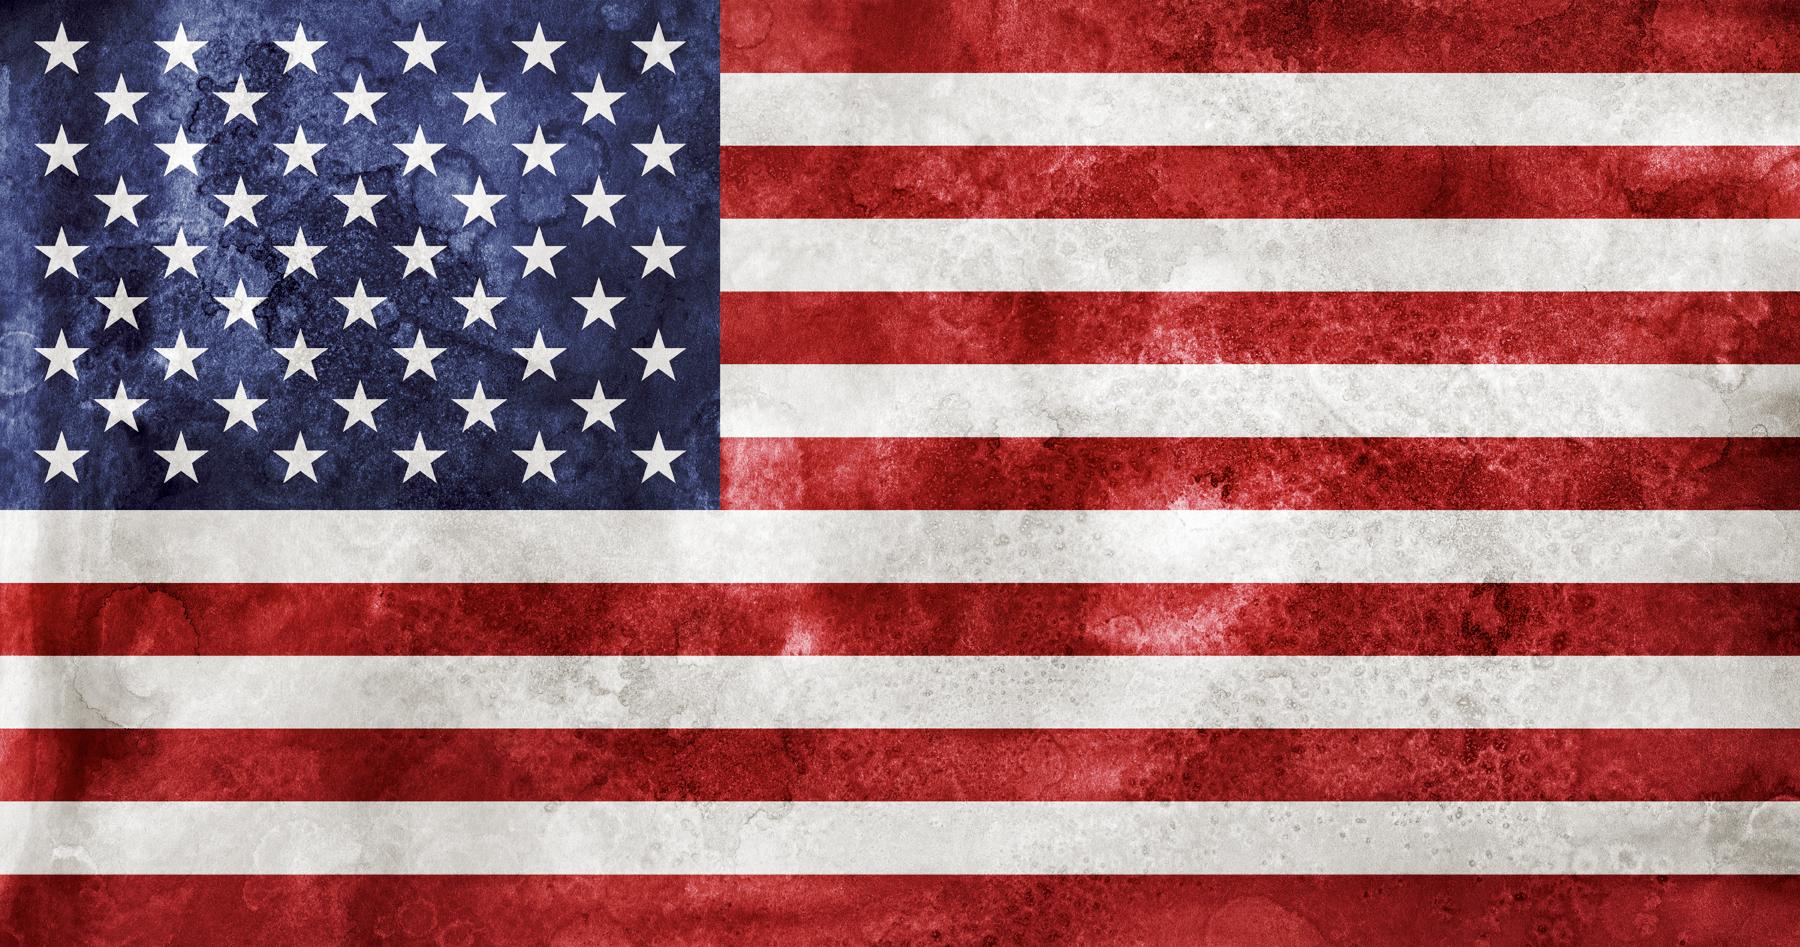 Acrylic Grunge Flag - USA, Acrylic, Resource, Stars, Star, HQ Photo